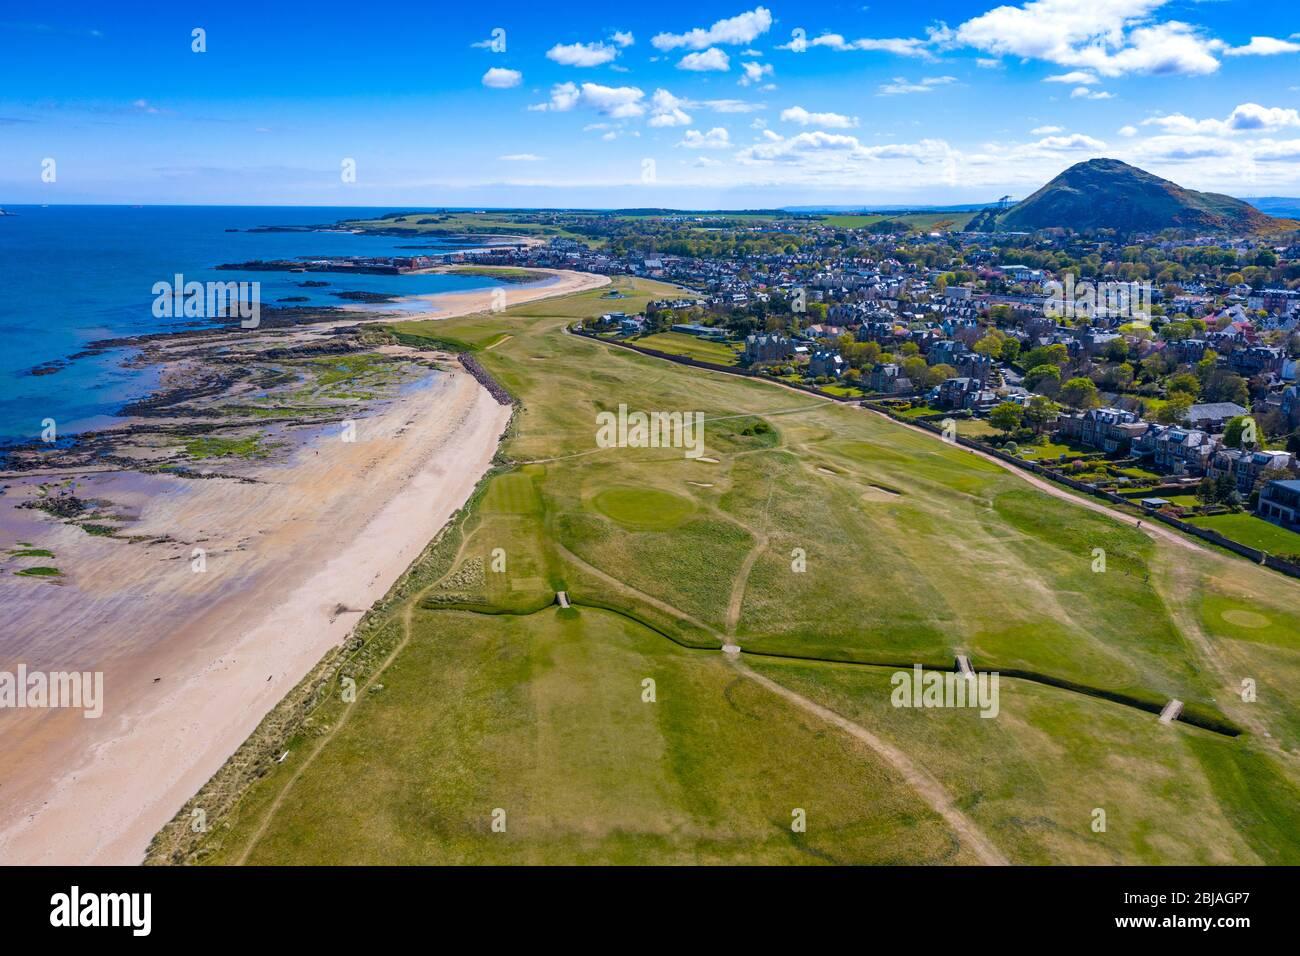 Aerial view of North Berwick beach and North Berwick Golf Club, East Lothian, Scotland, UK Stock Photo